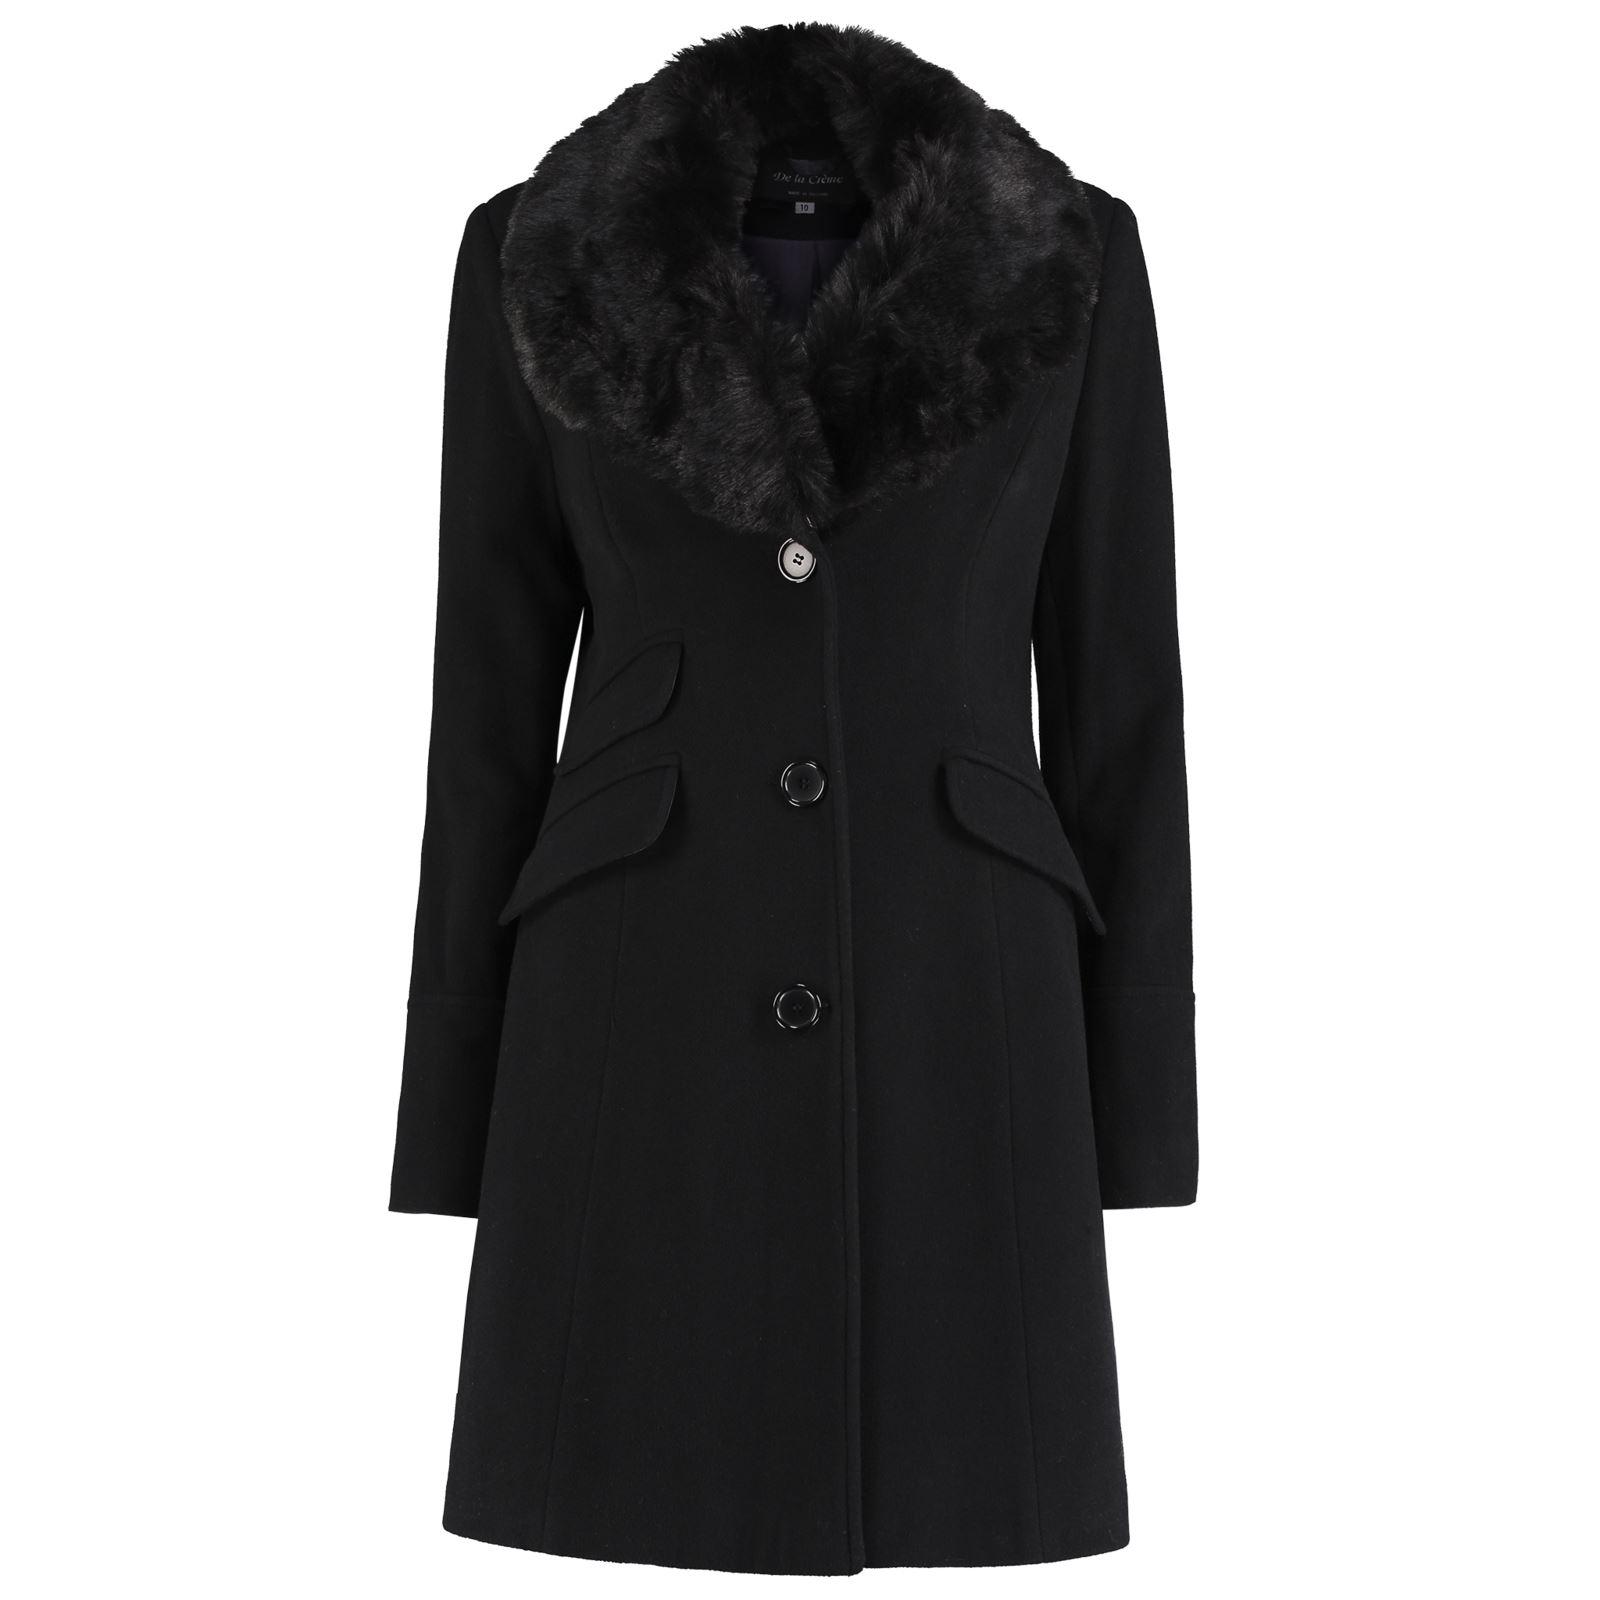 De-La-Creme-Womens-Wool-Blend-Faux-Fur-Collar-Midi-Coat thumbnail 5